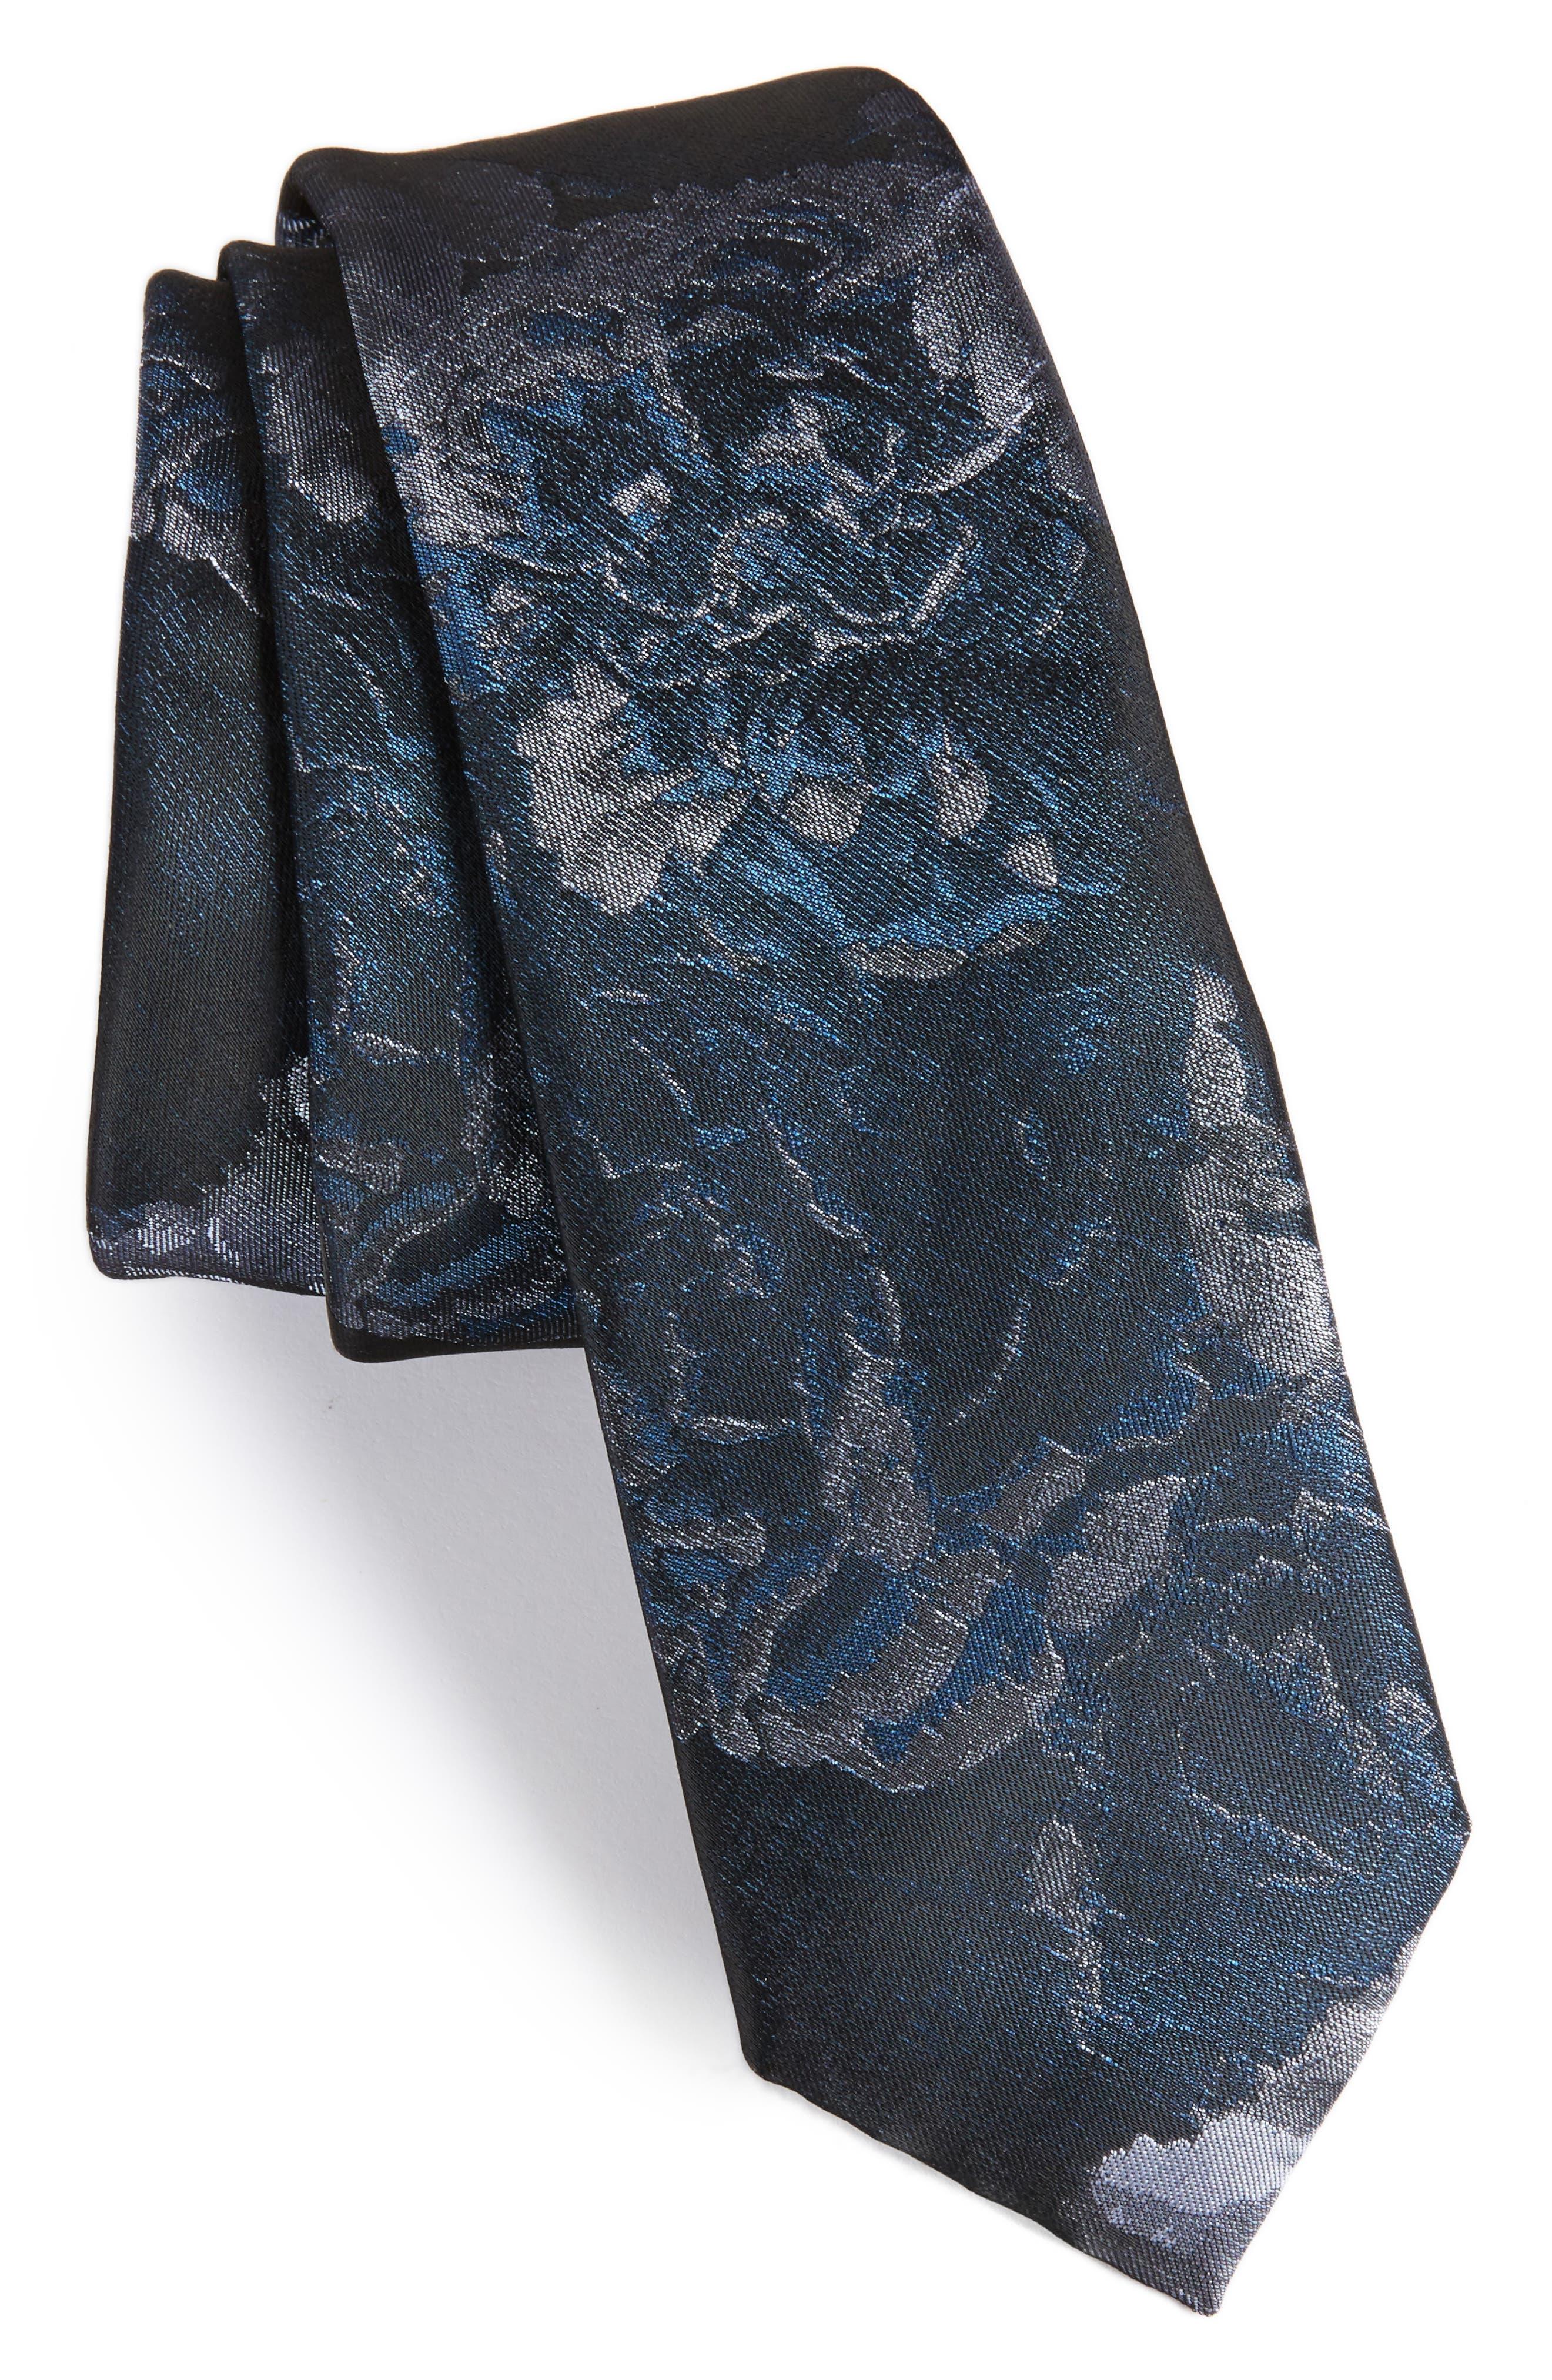 Floral Tie,                             Main thumbnail 1, color,                             Navy Blue